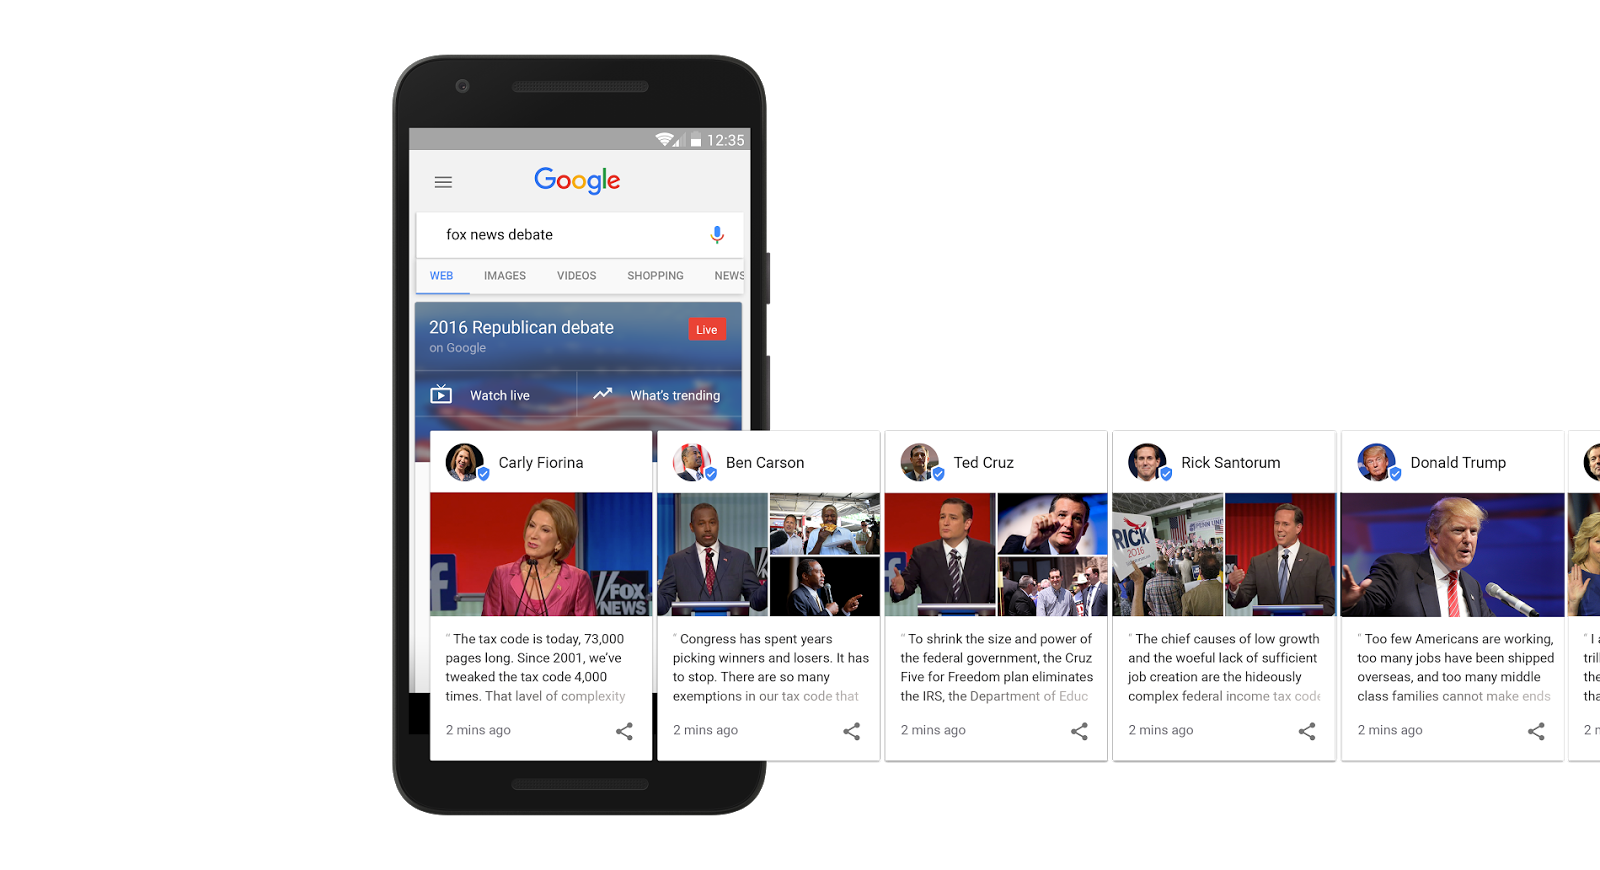 Google presidentskandidaten